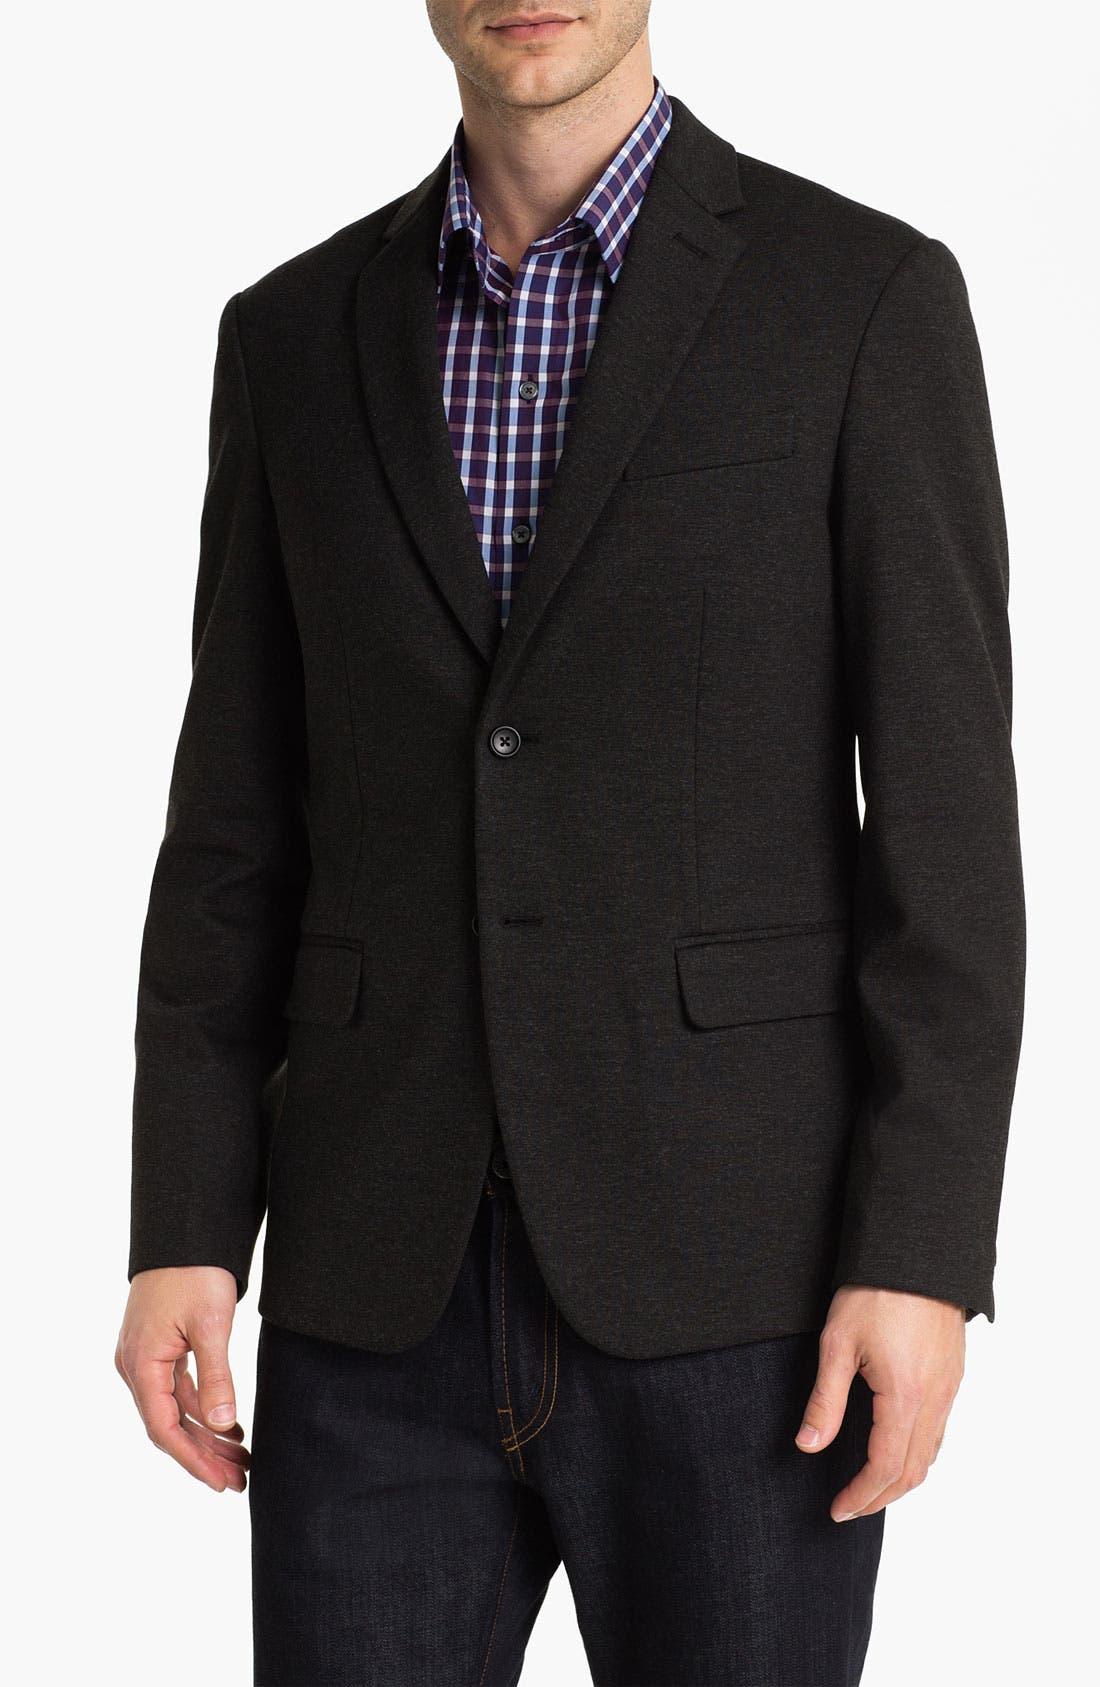 Alternate Image 1 Selected - Calibrate 'Endell' Knit Sportcoat